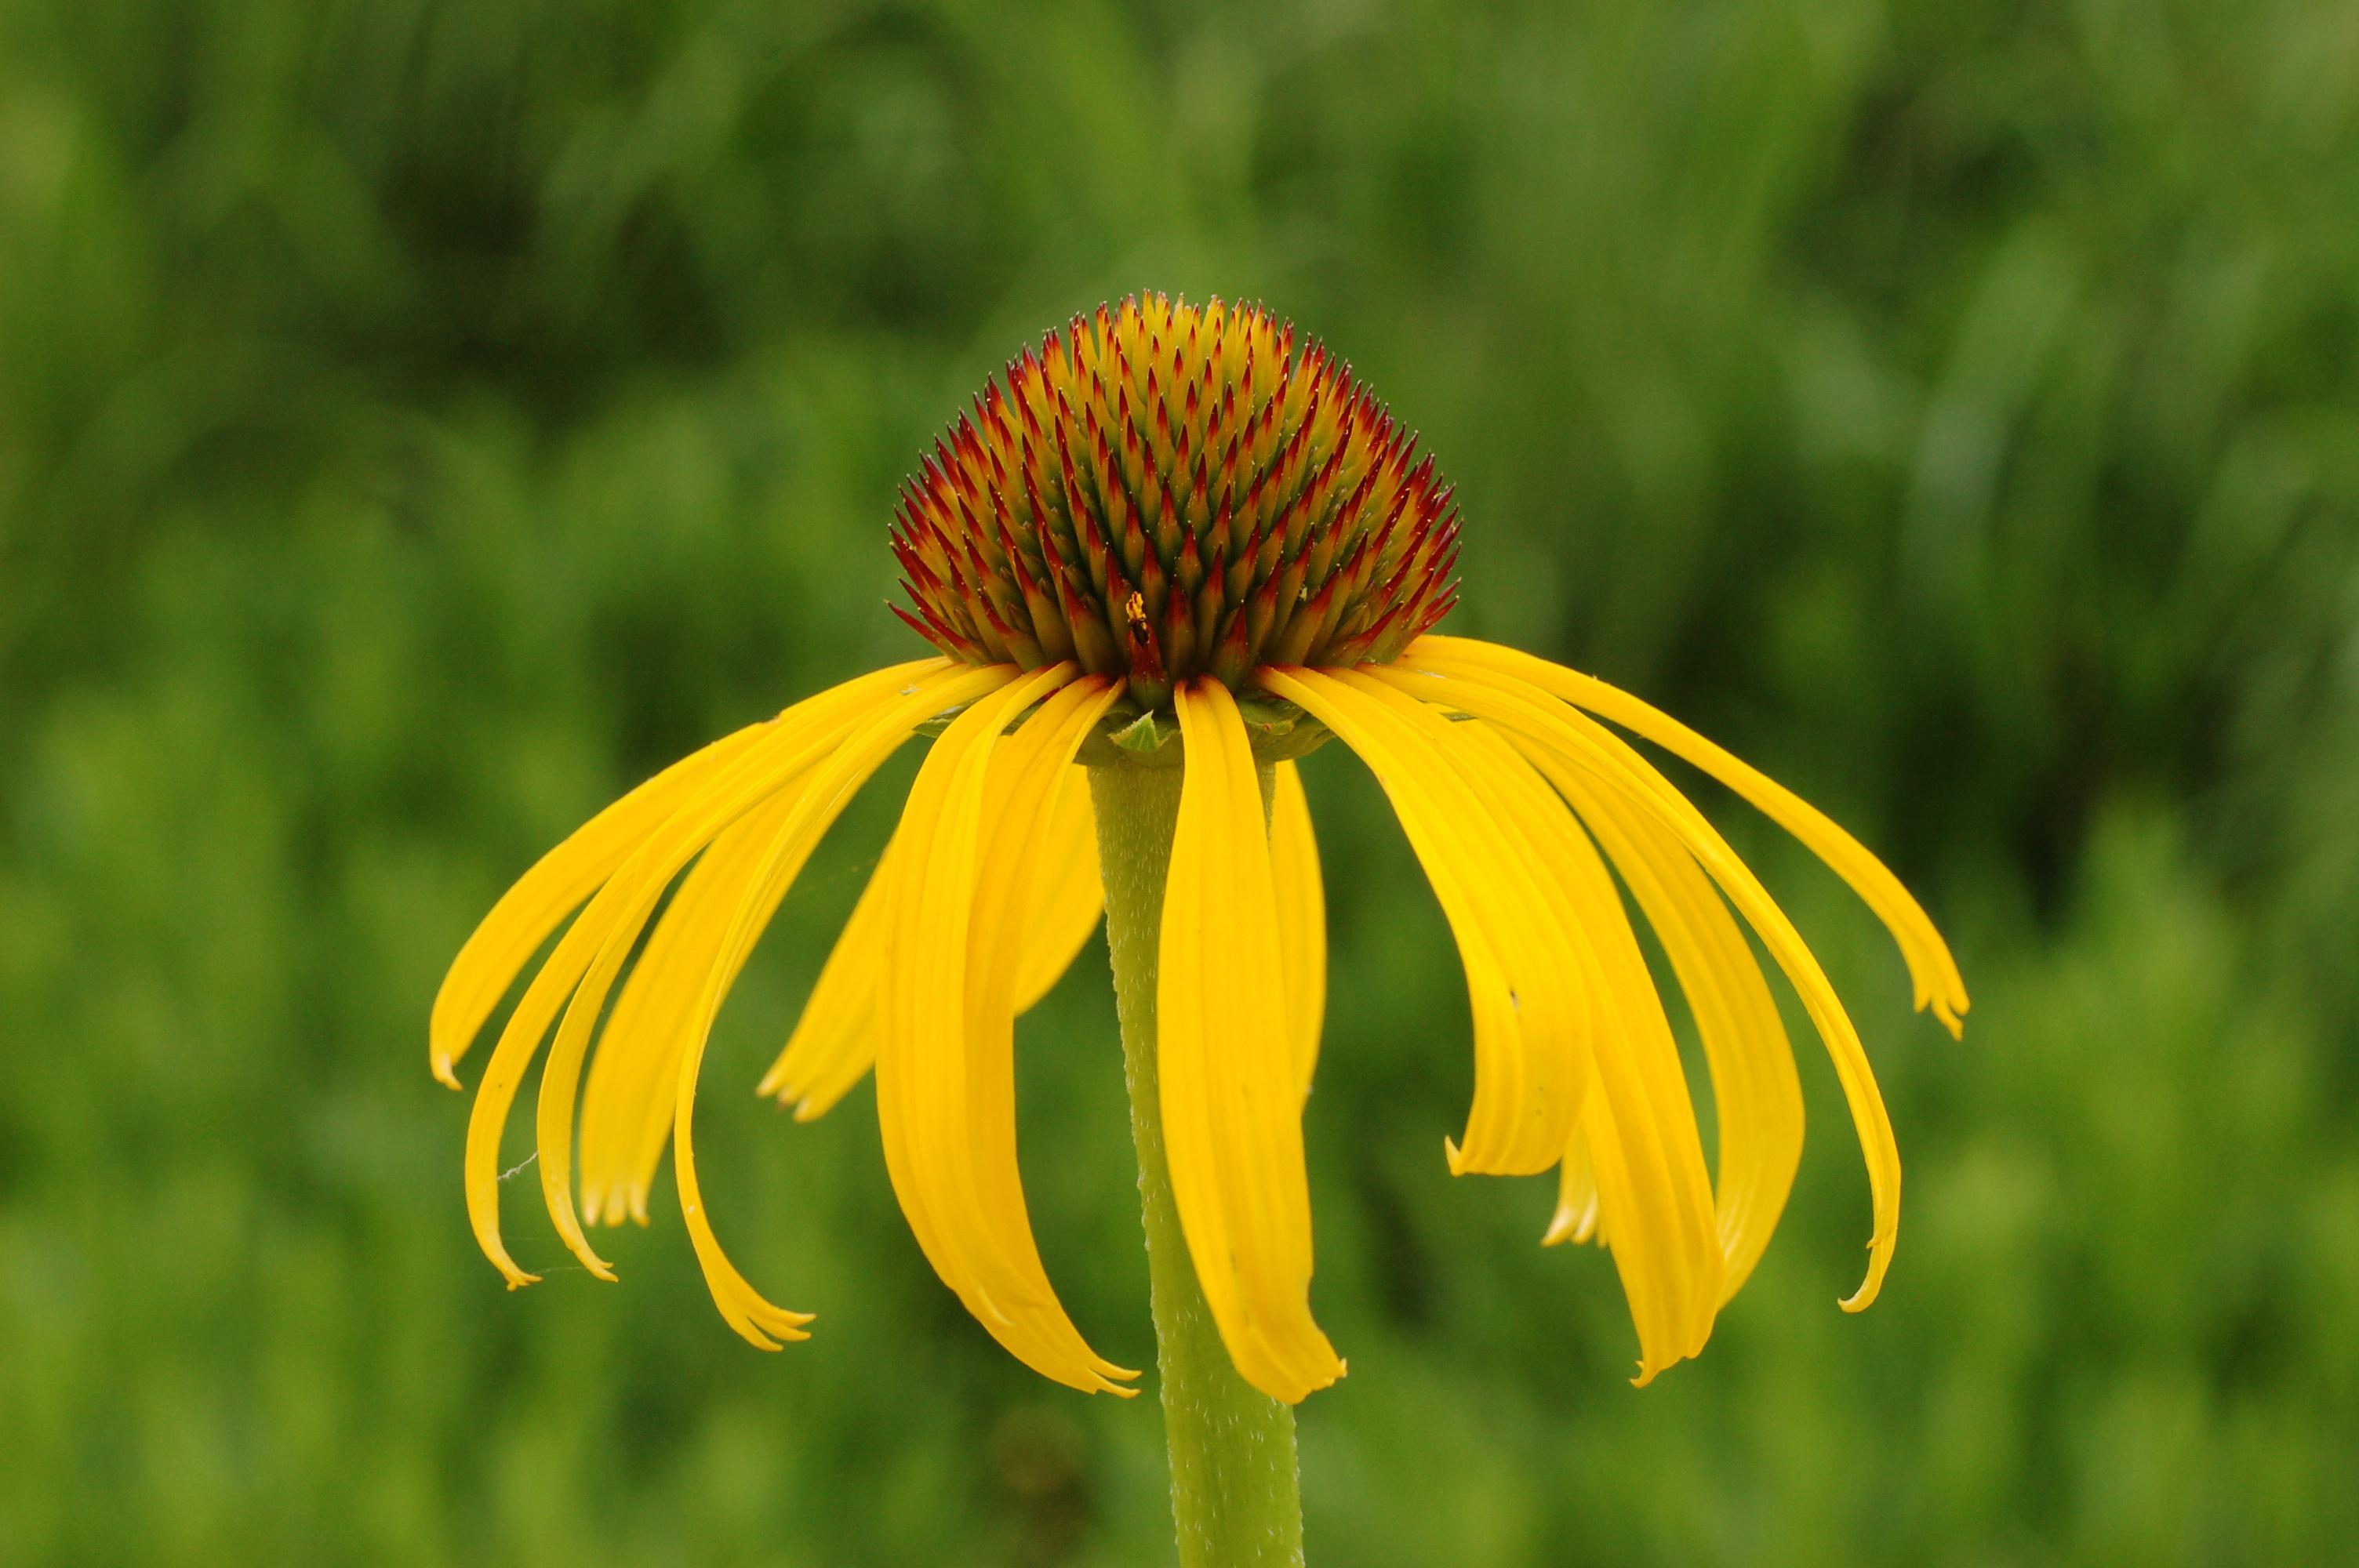 Fileyellow Coneflower Echinacea Paradoxa Horizontal 3008pxg